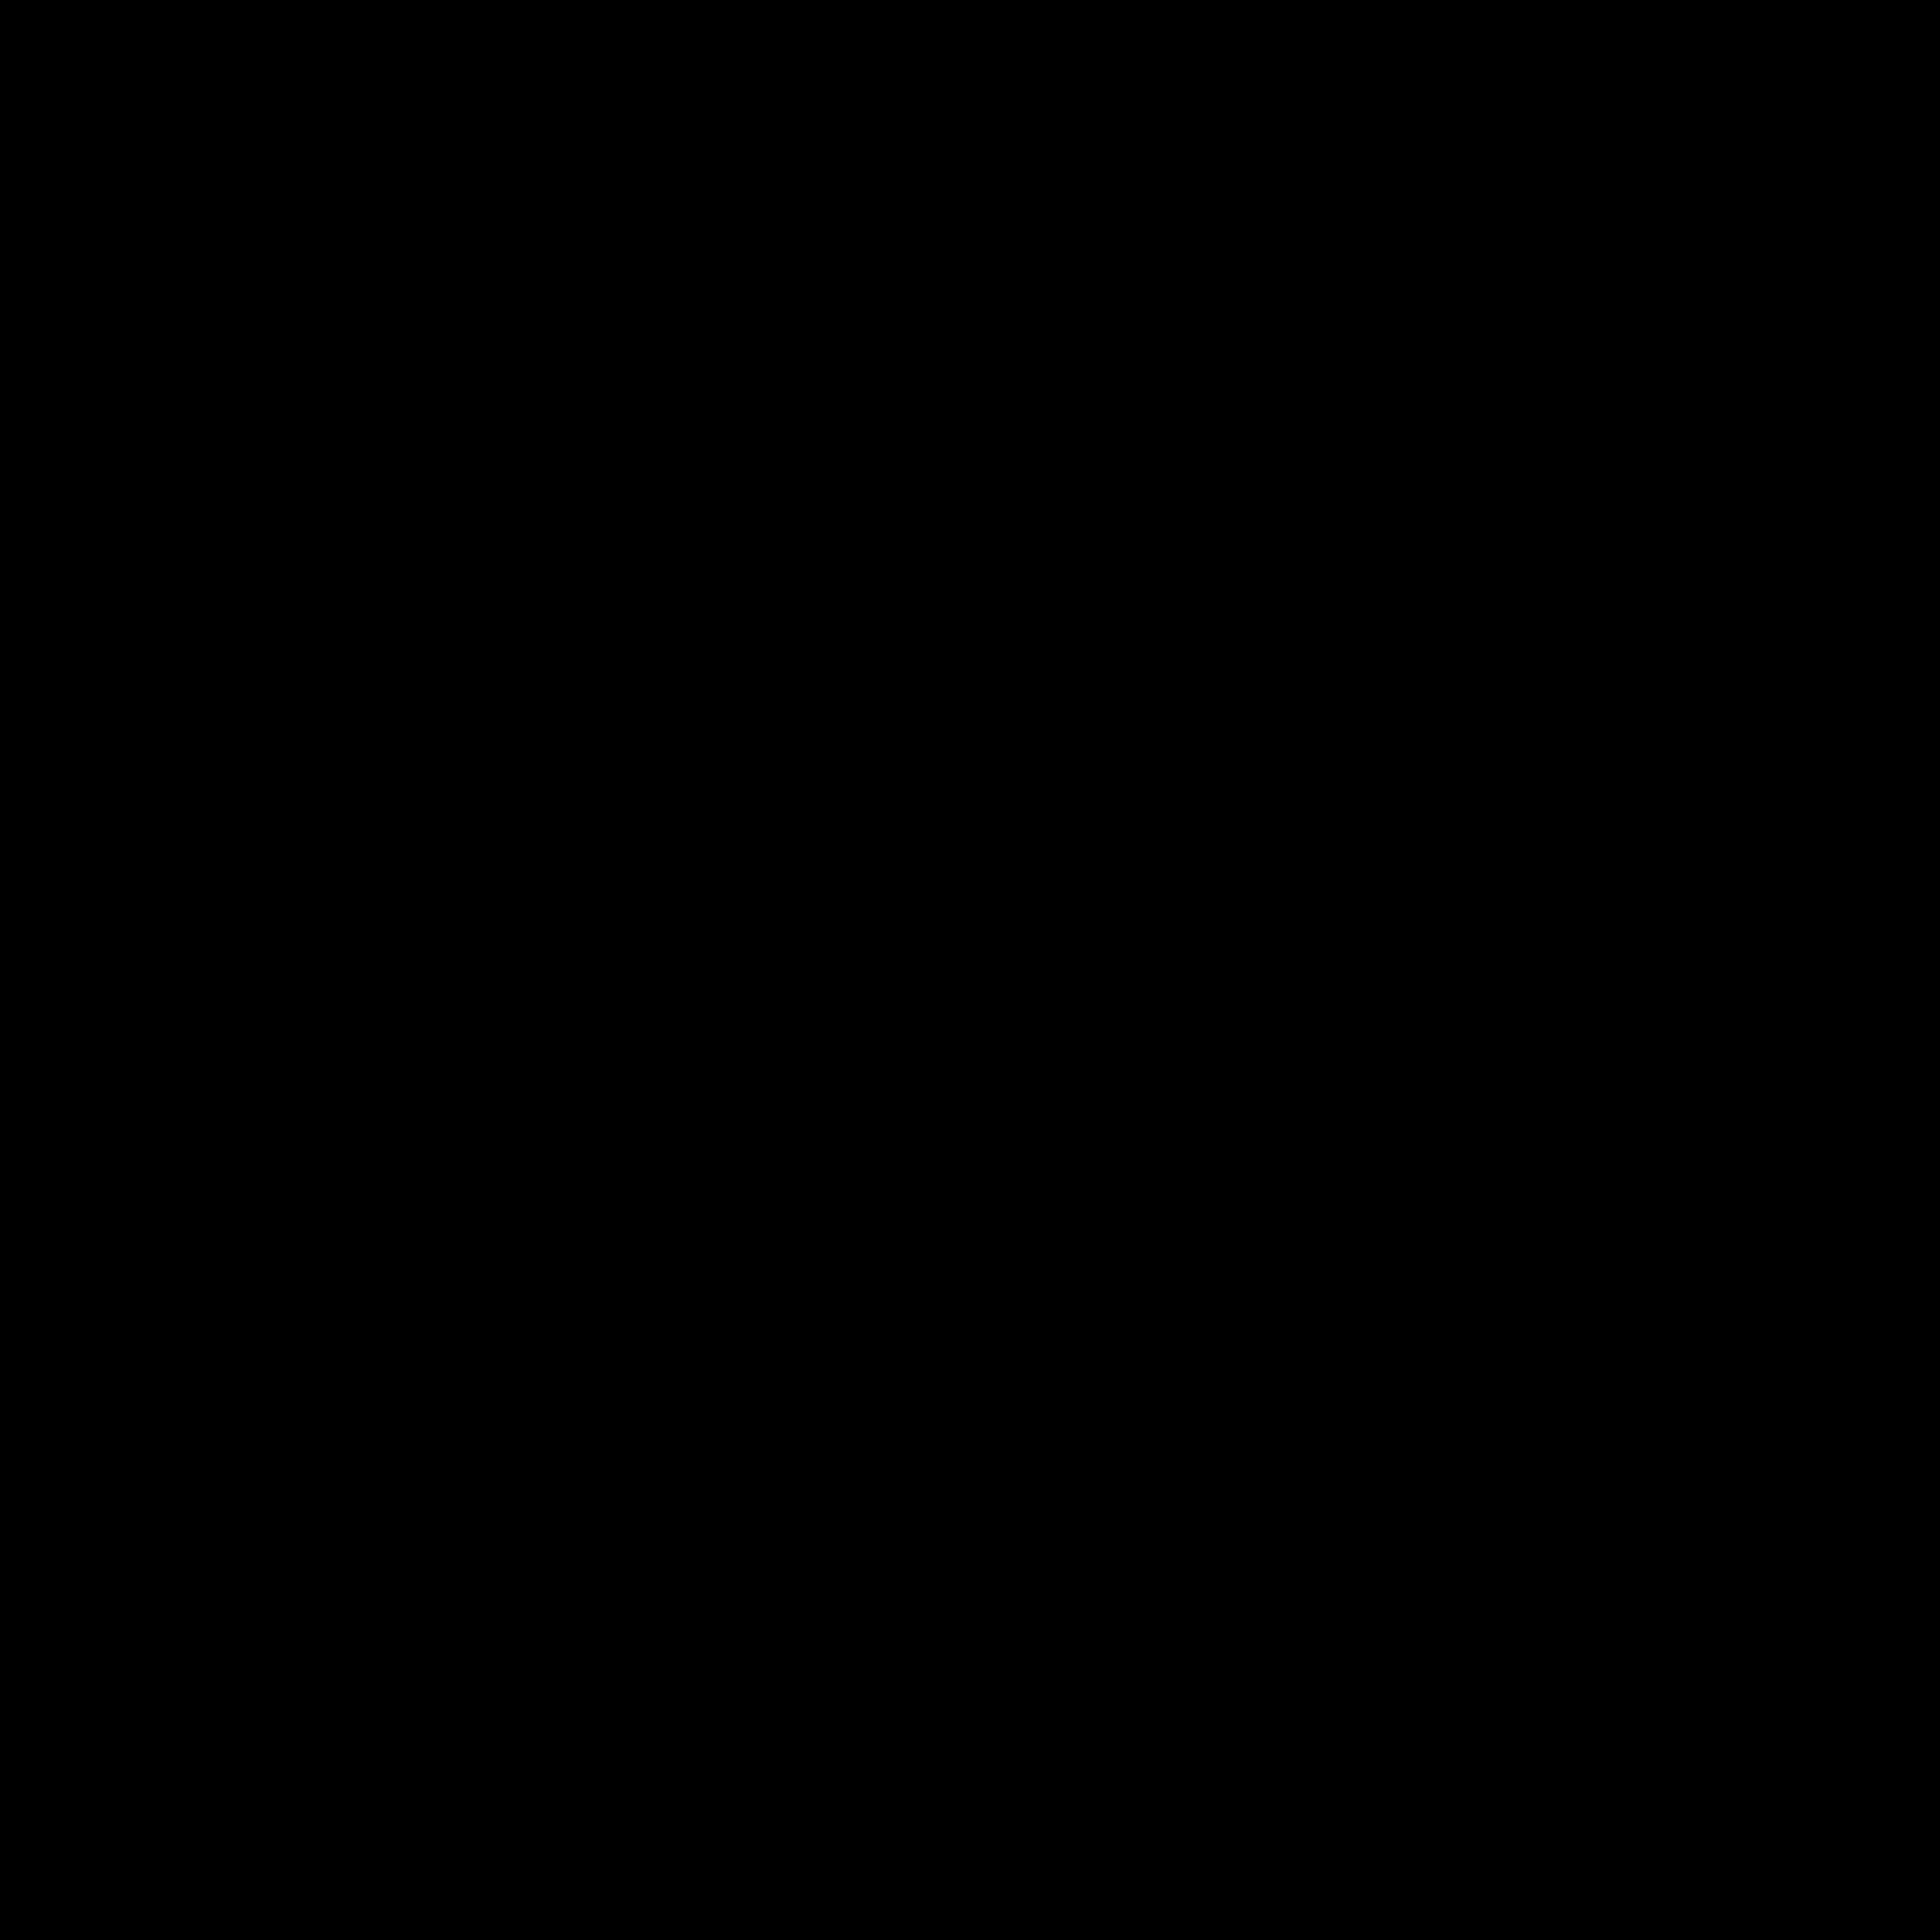 starzplay logo 0 - STARZPLAY Logo